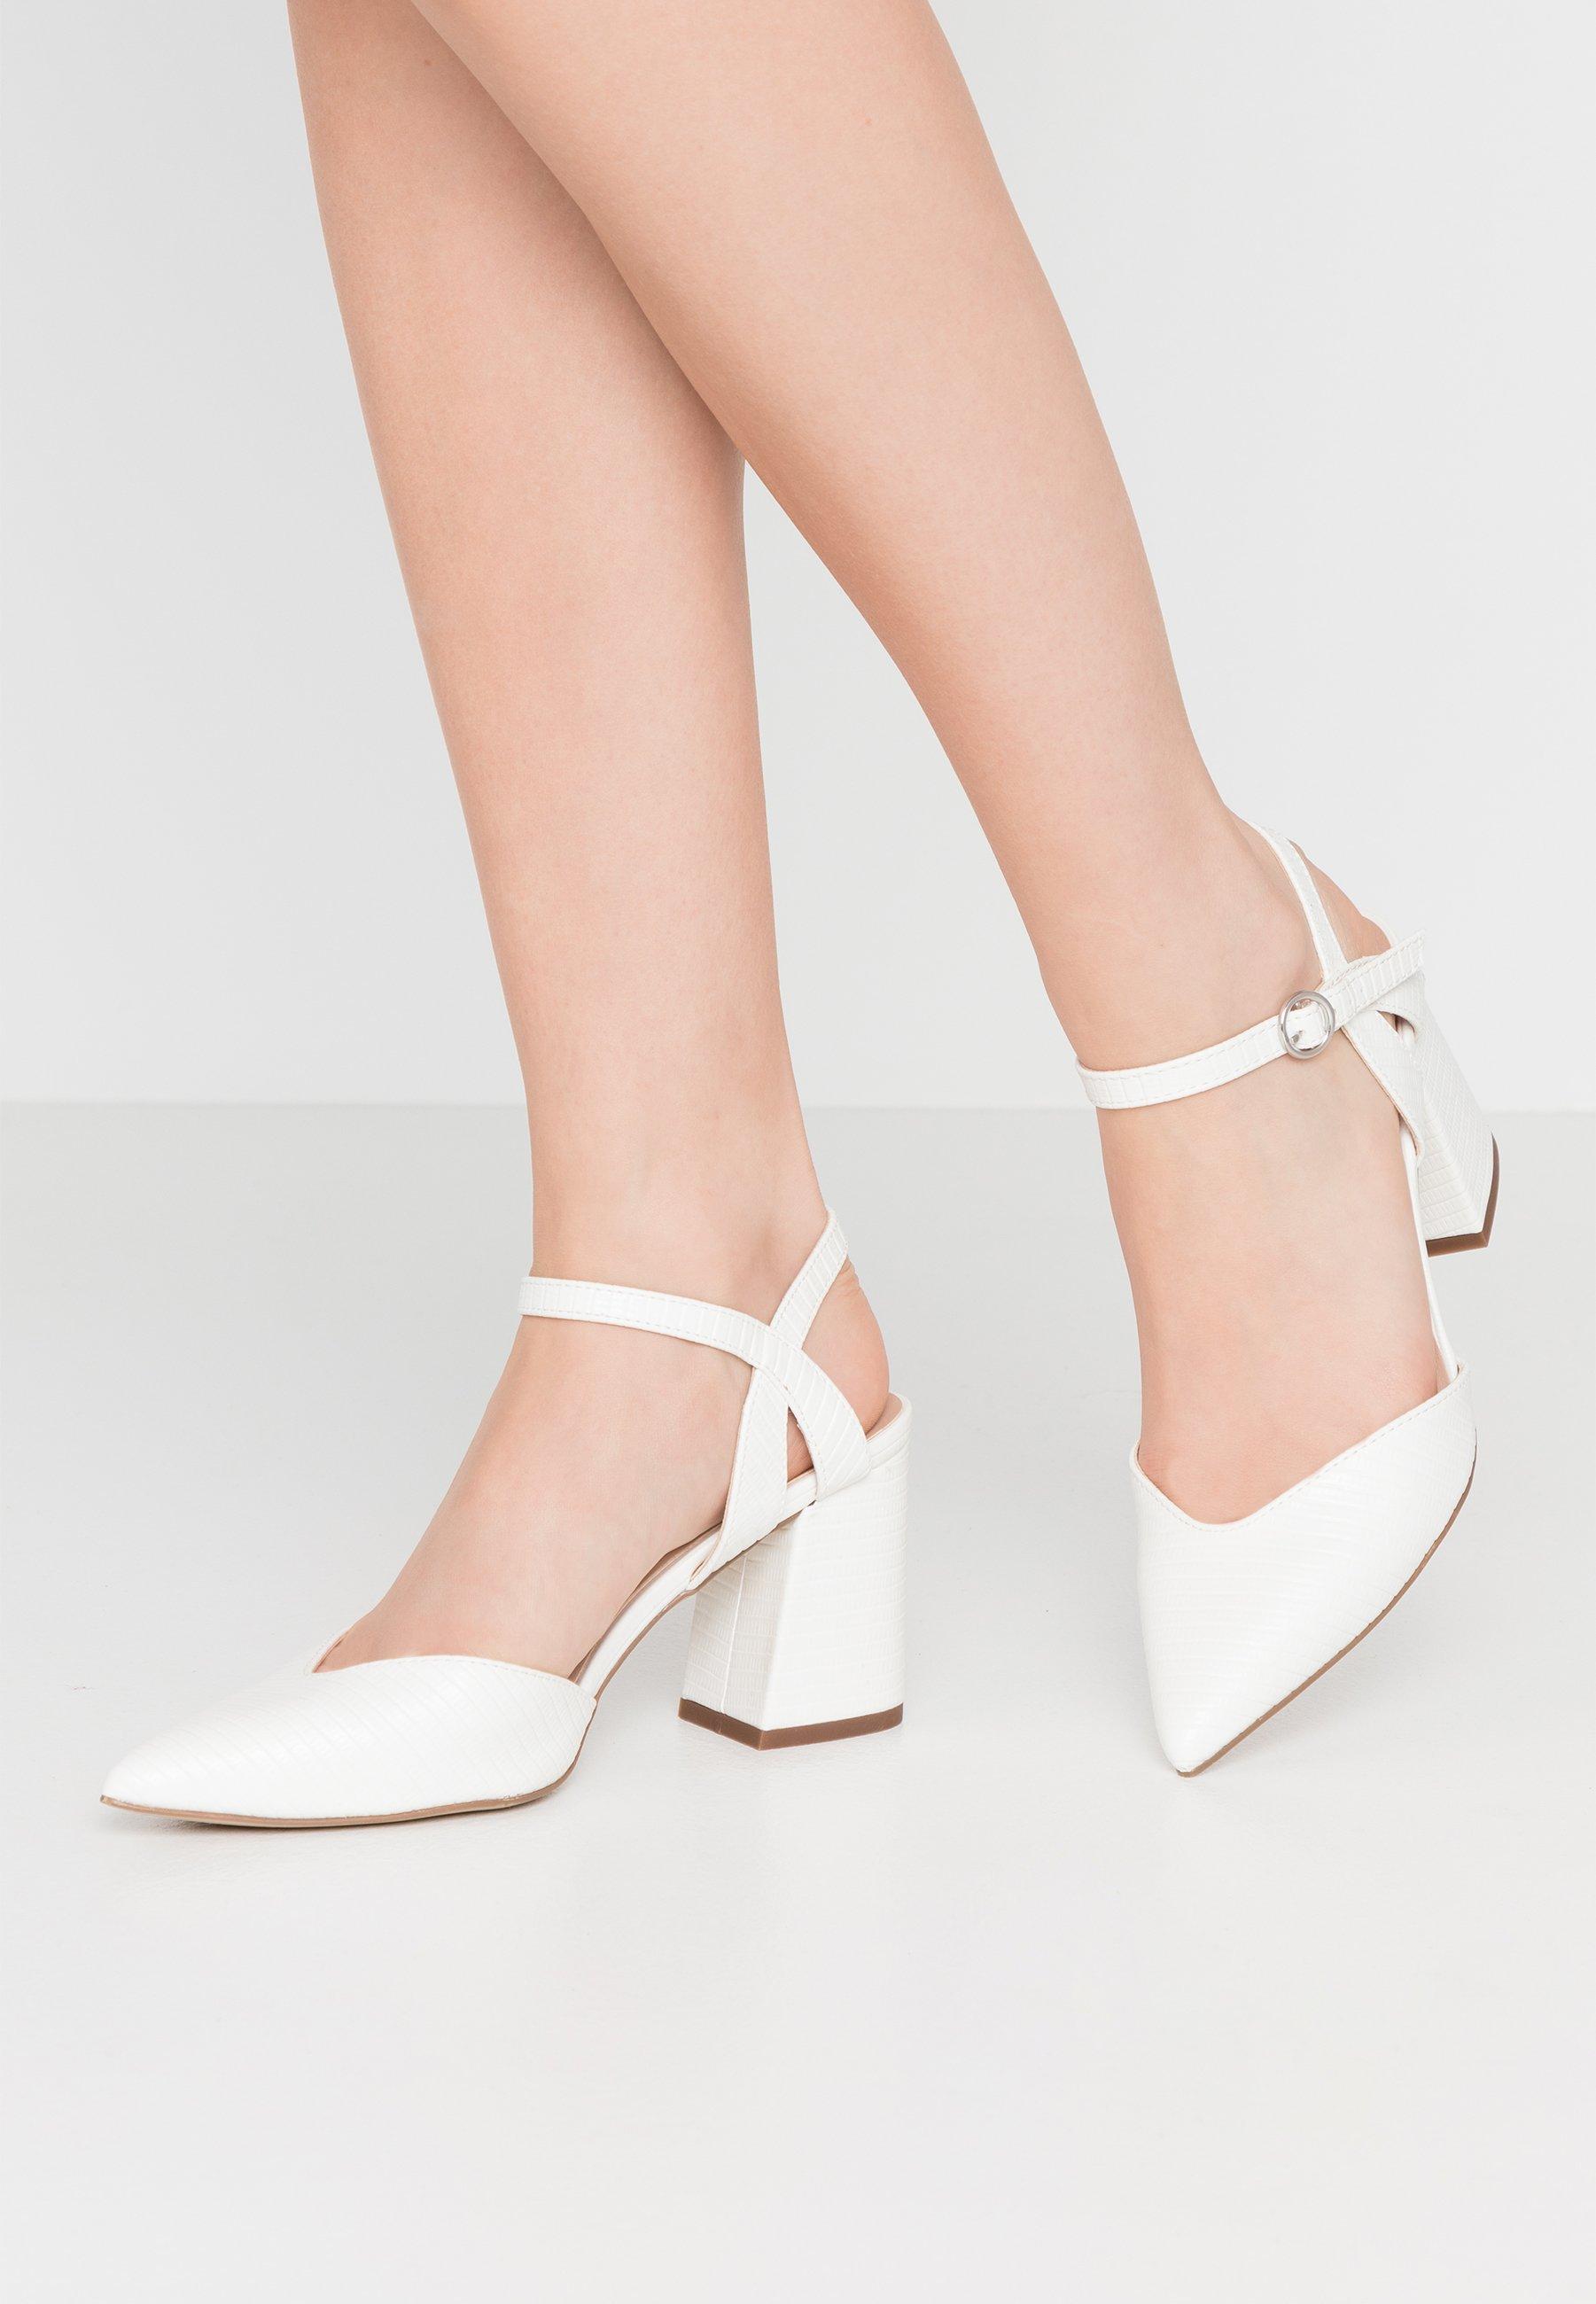 New Look RAYLA   High Heel Pumps   white/weiß   Zalando.de